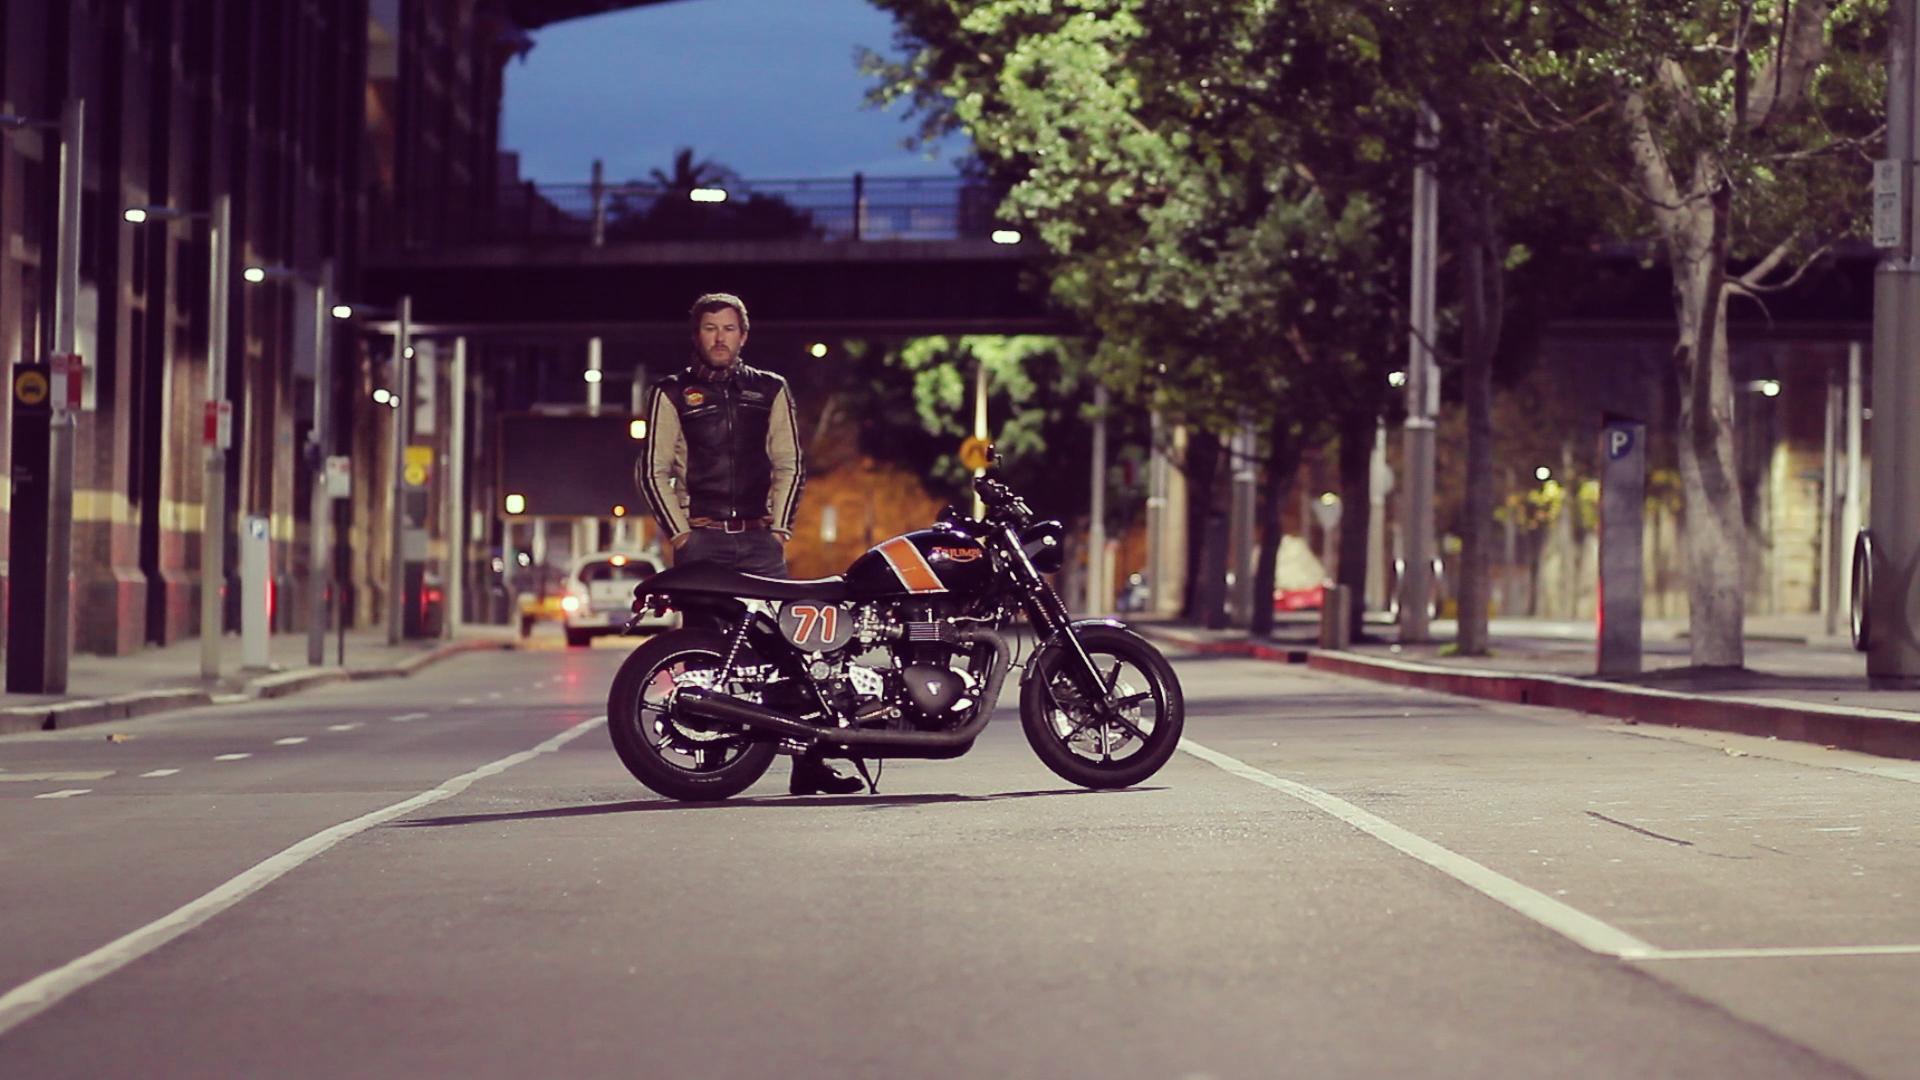 Stories_of_Bike_Carl_2.jpg